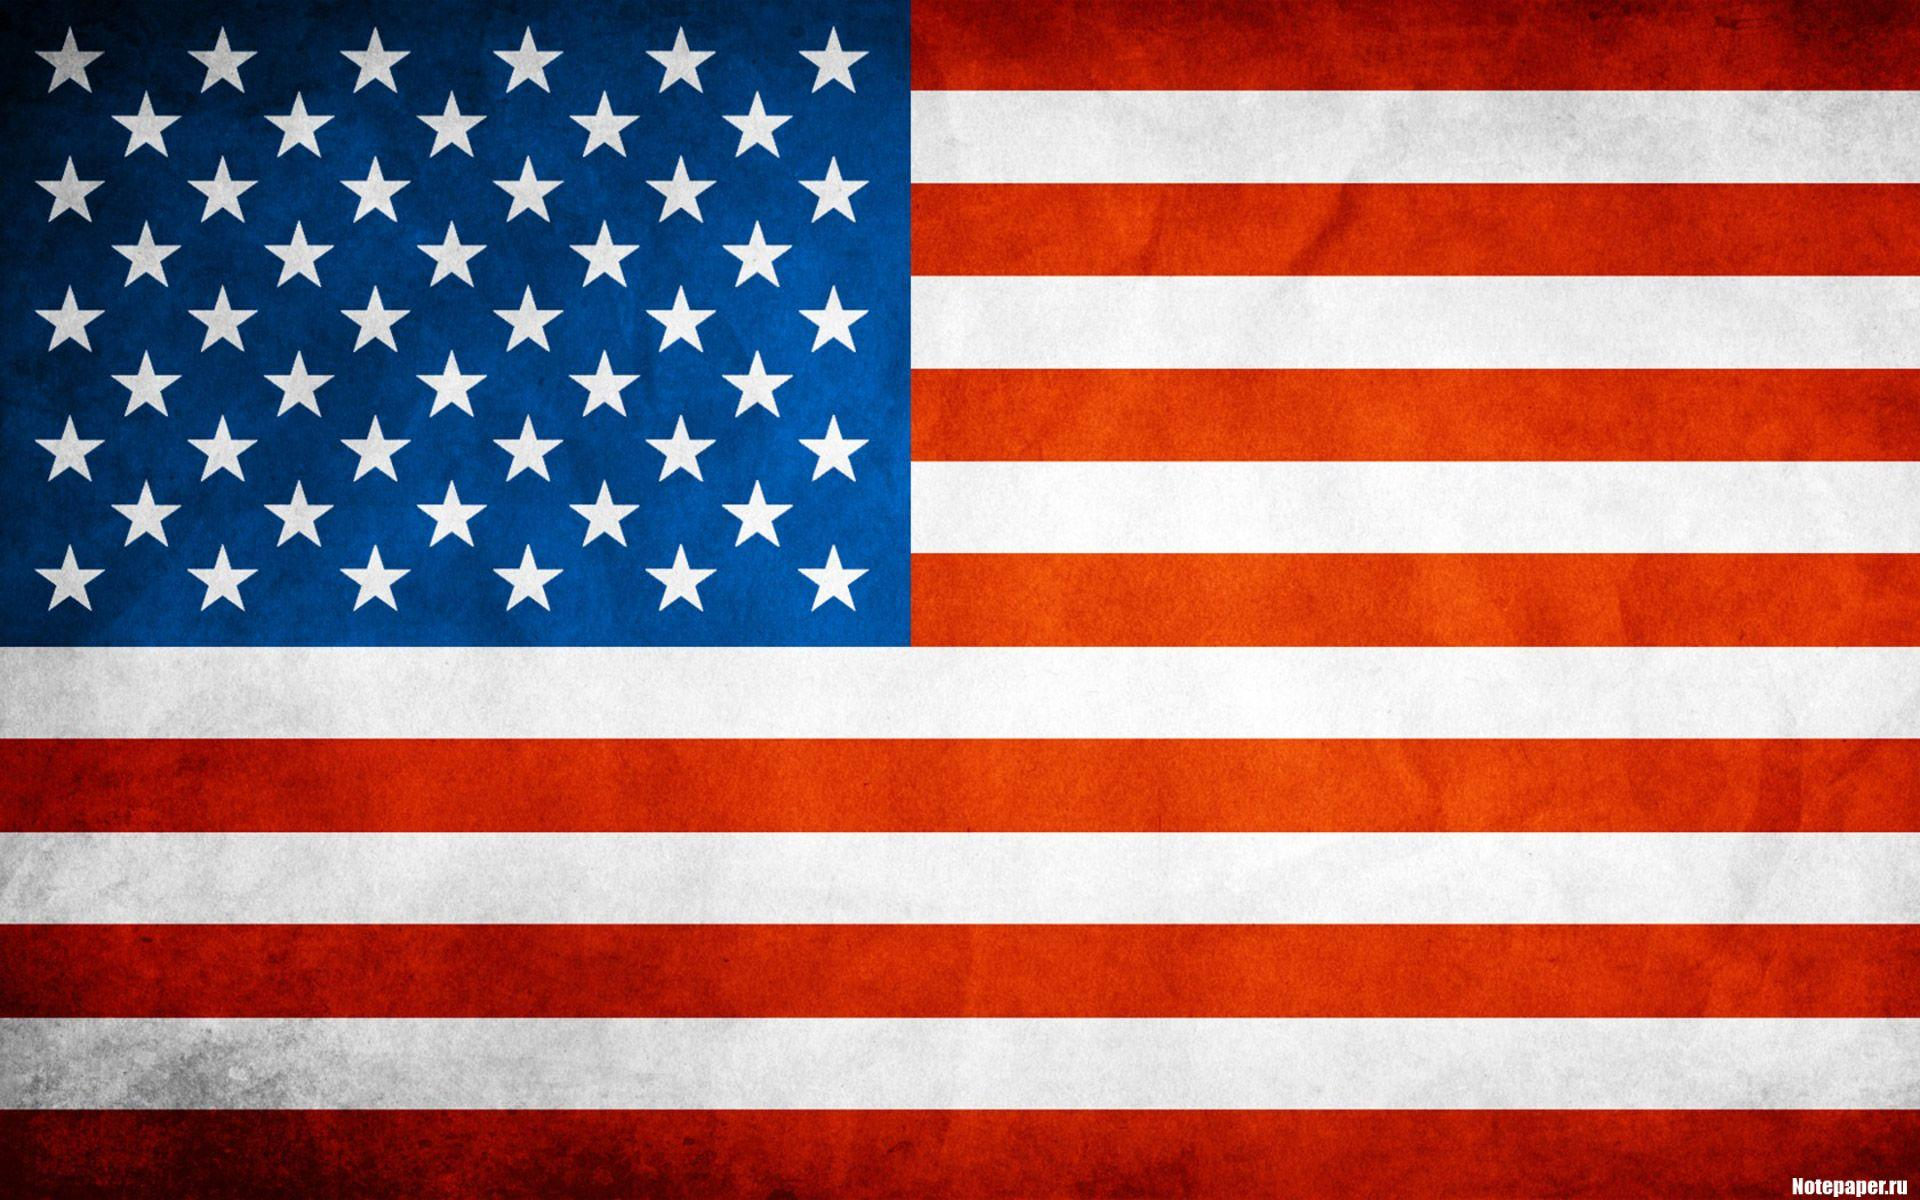 American Flag Hd Wallpapers Top Free American Flag Hd